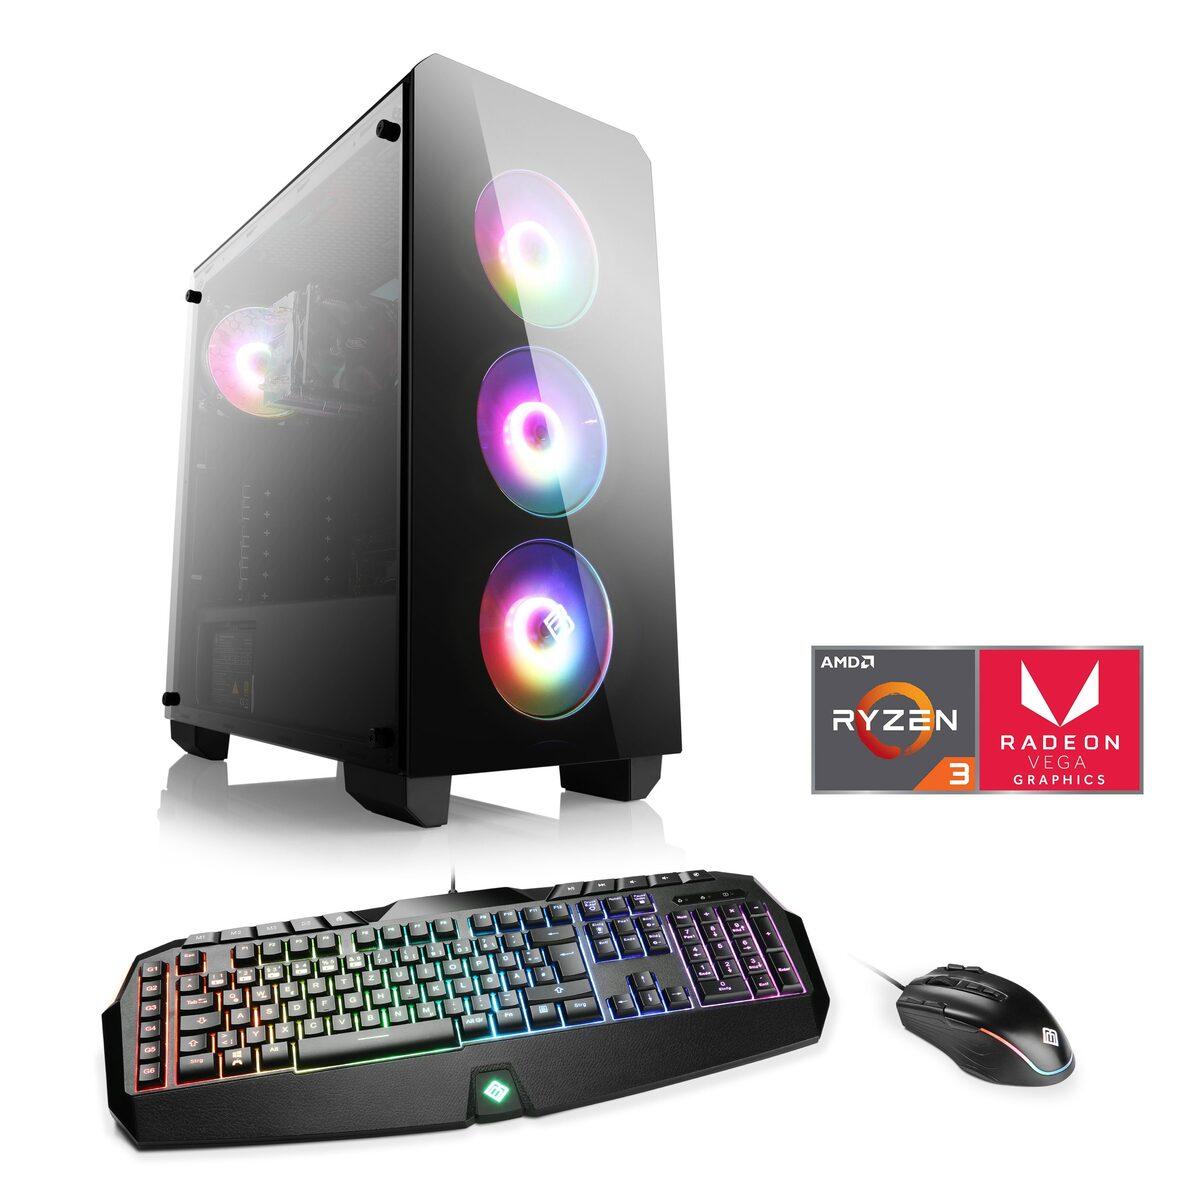 Bild 1 von CSL Levitas T8118 Windows 10 Home Gaming-PC (AMD Ryzen 3, Radeon Vega 8, 16 GB RAM, 1000 GB SSD, AMD Ryzen 3 3200G, Vega 8, 16 GB RAM, SSD)